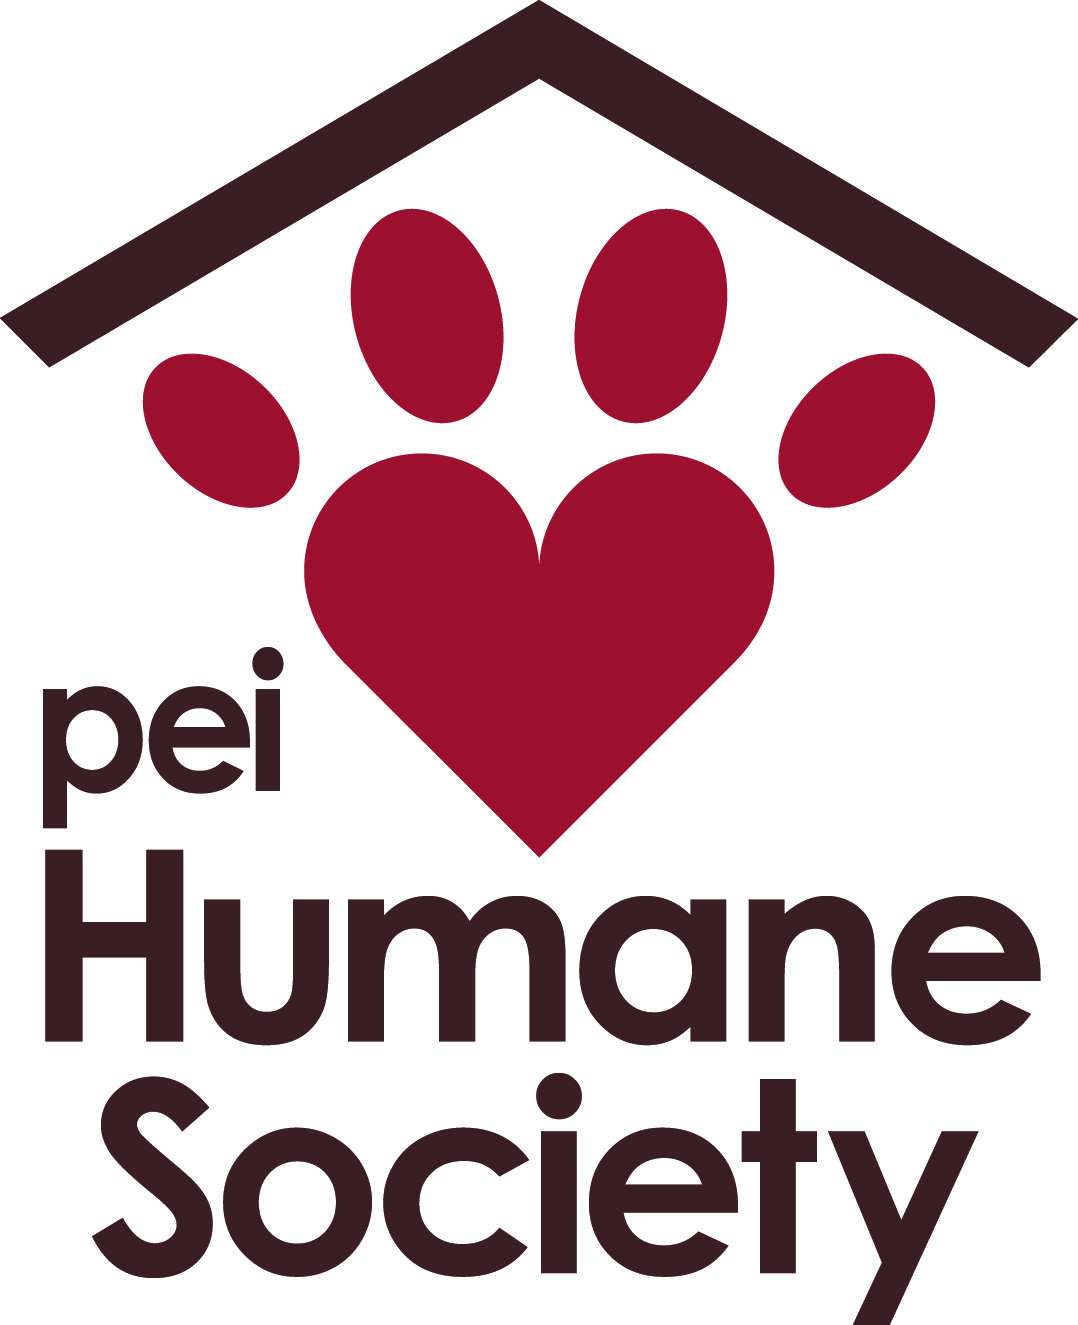 PEIHumaneSociety Vert COL Logo.jpg